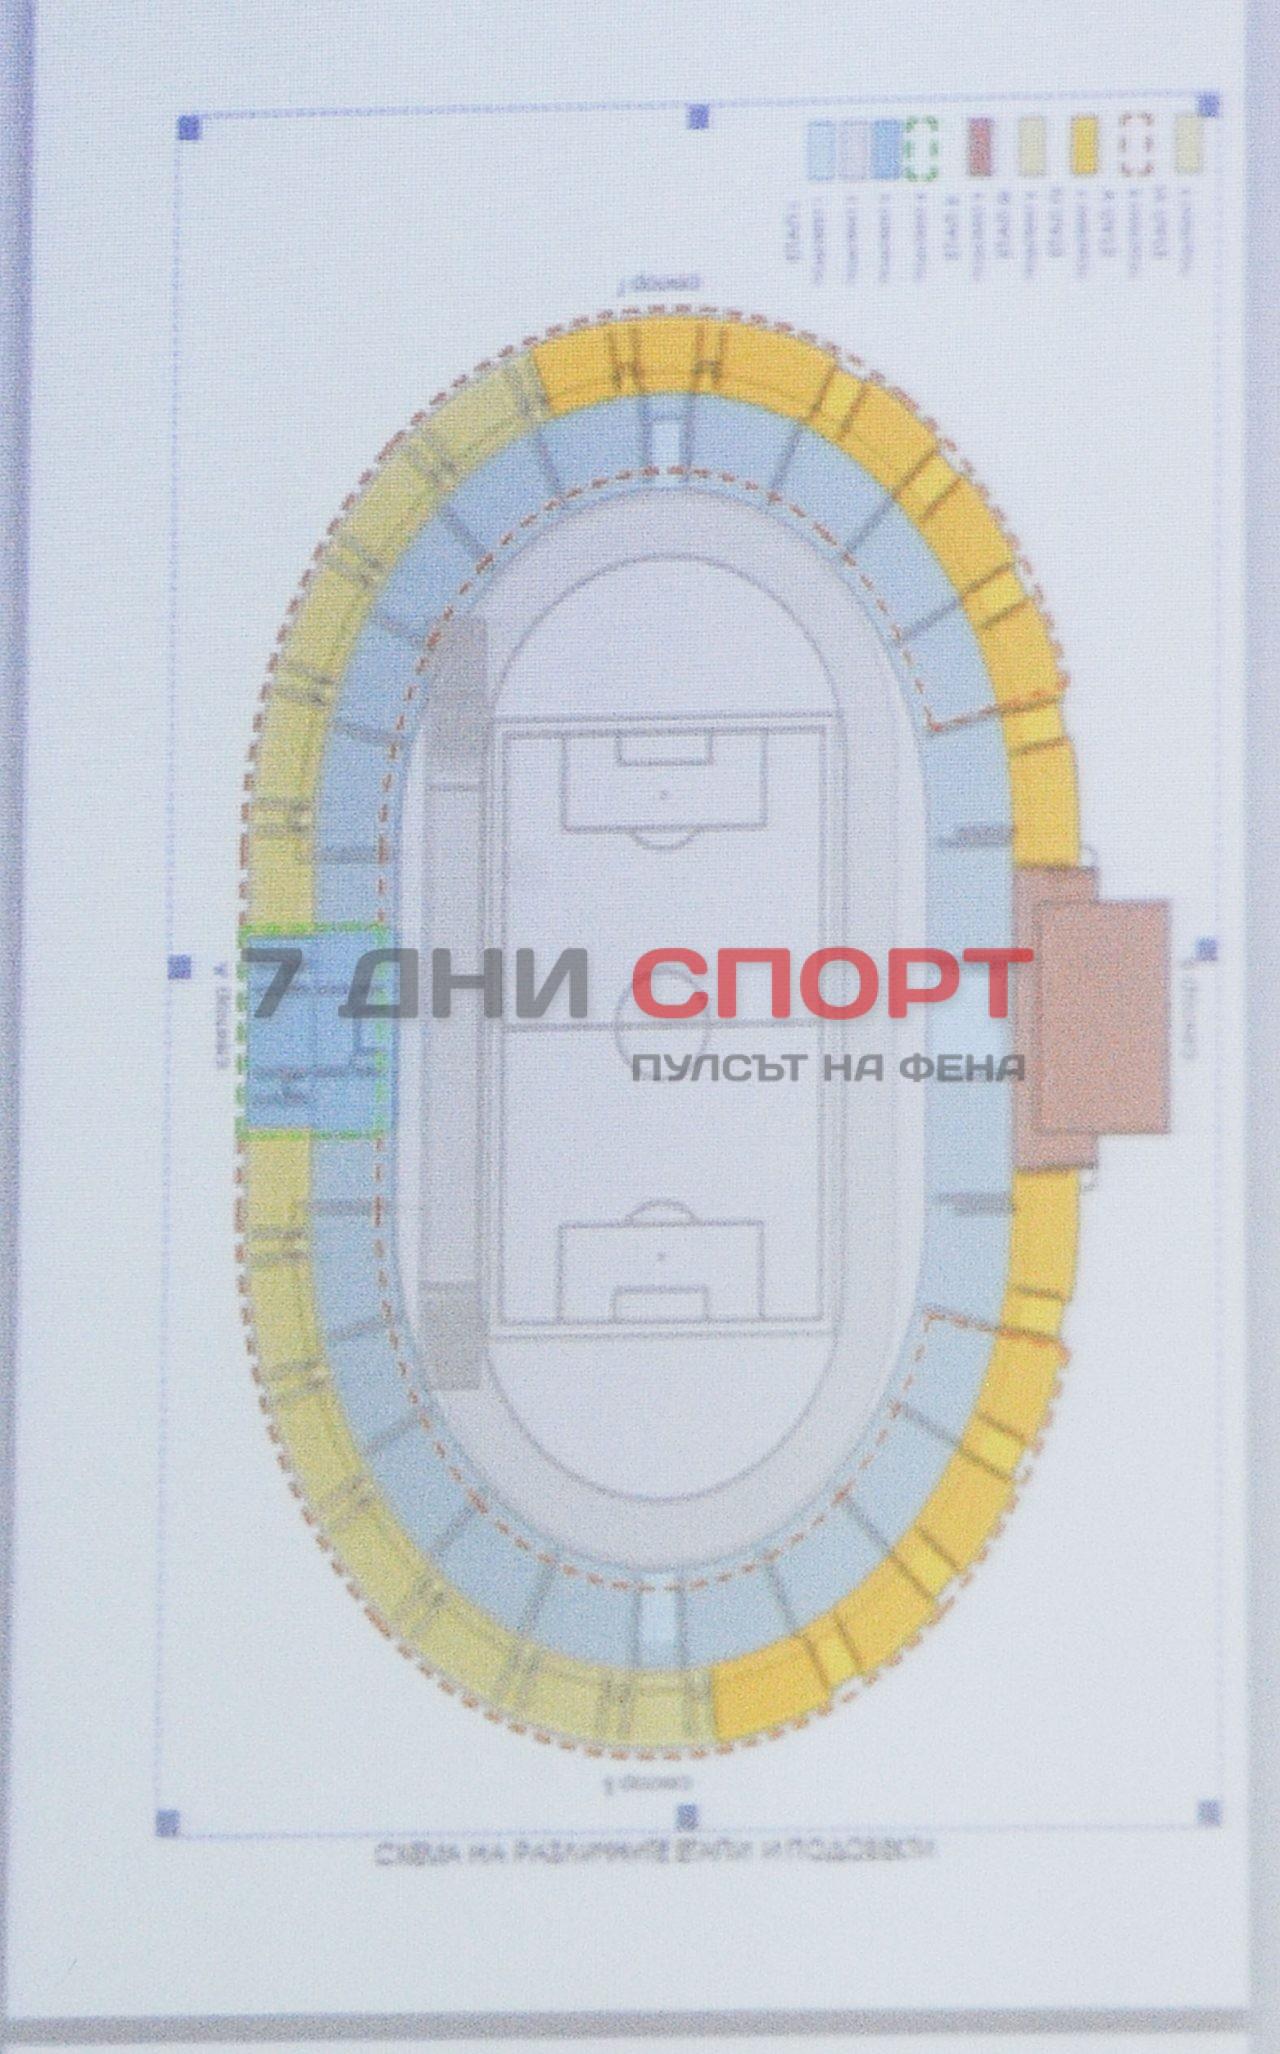 -Пловдив004-1280x2054.jpg